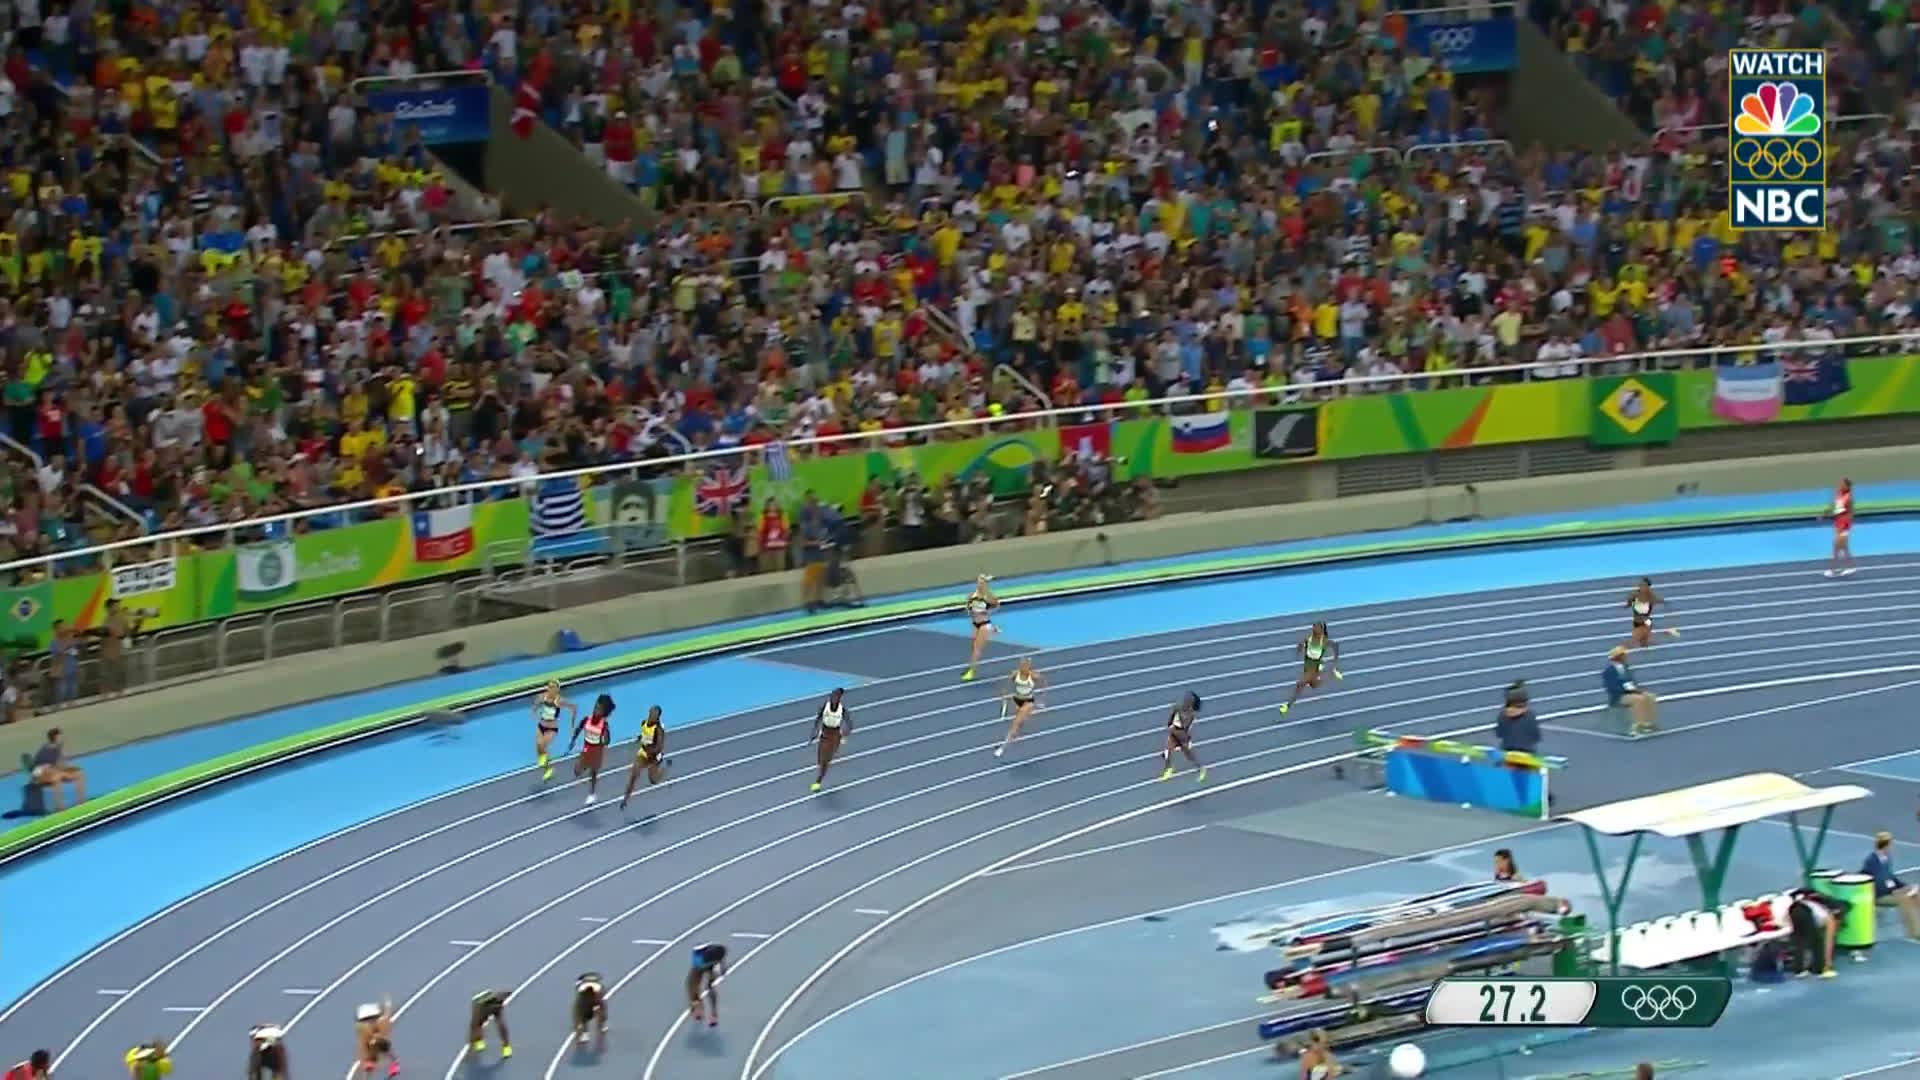 nbc sports, olymgifs, olympics, U.S. women's 4x100 relay team sprints to gold medal GIFs